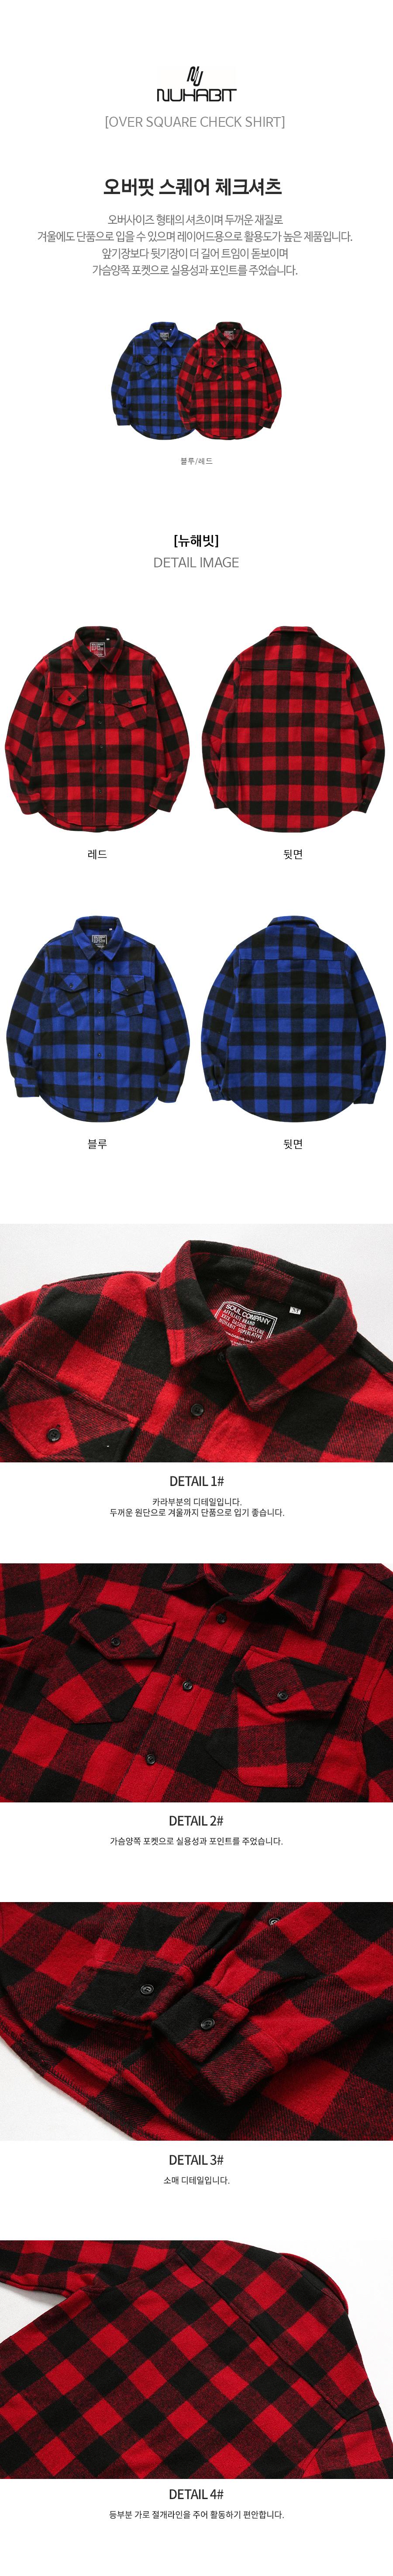 flannel_shirts_check.jpg